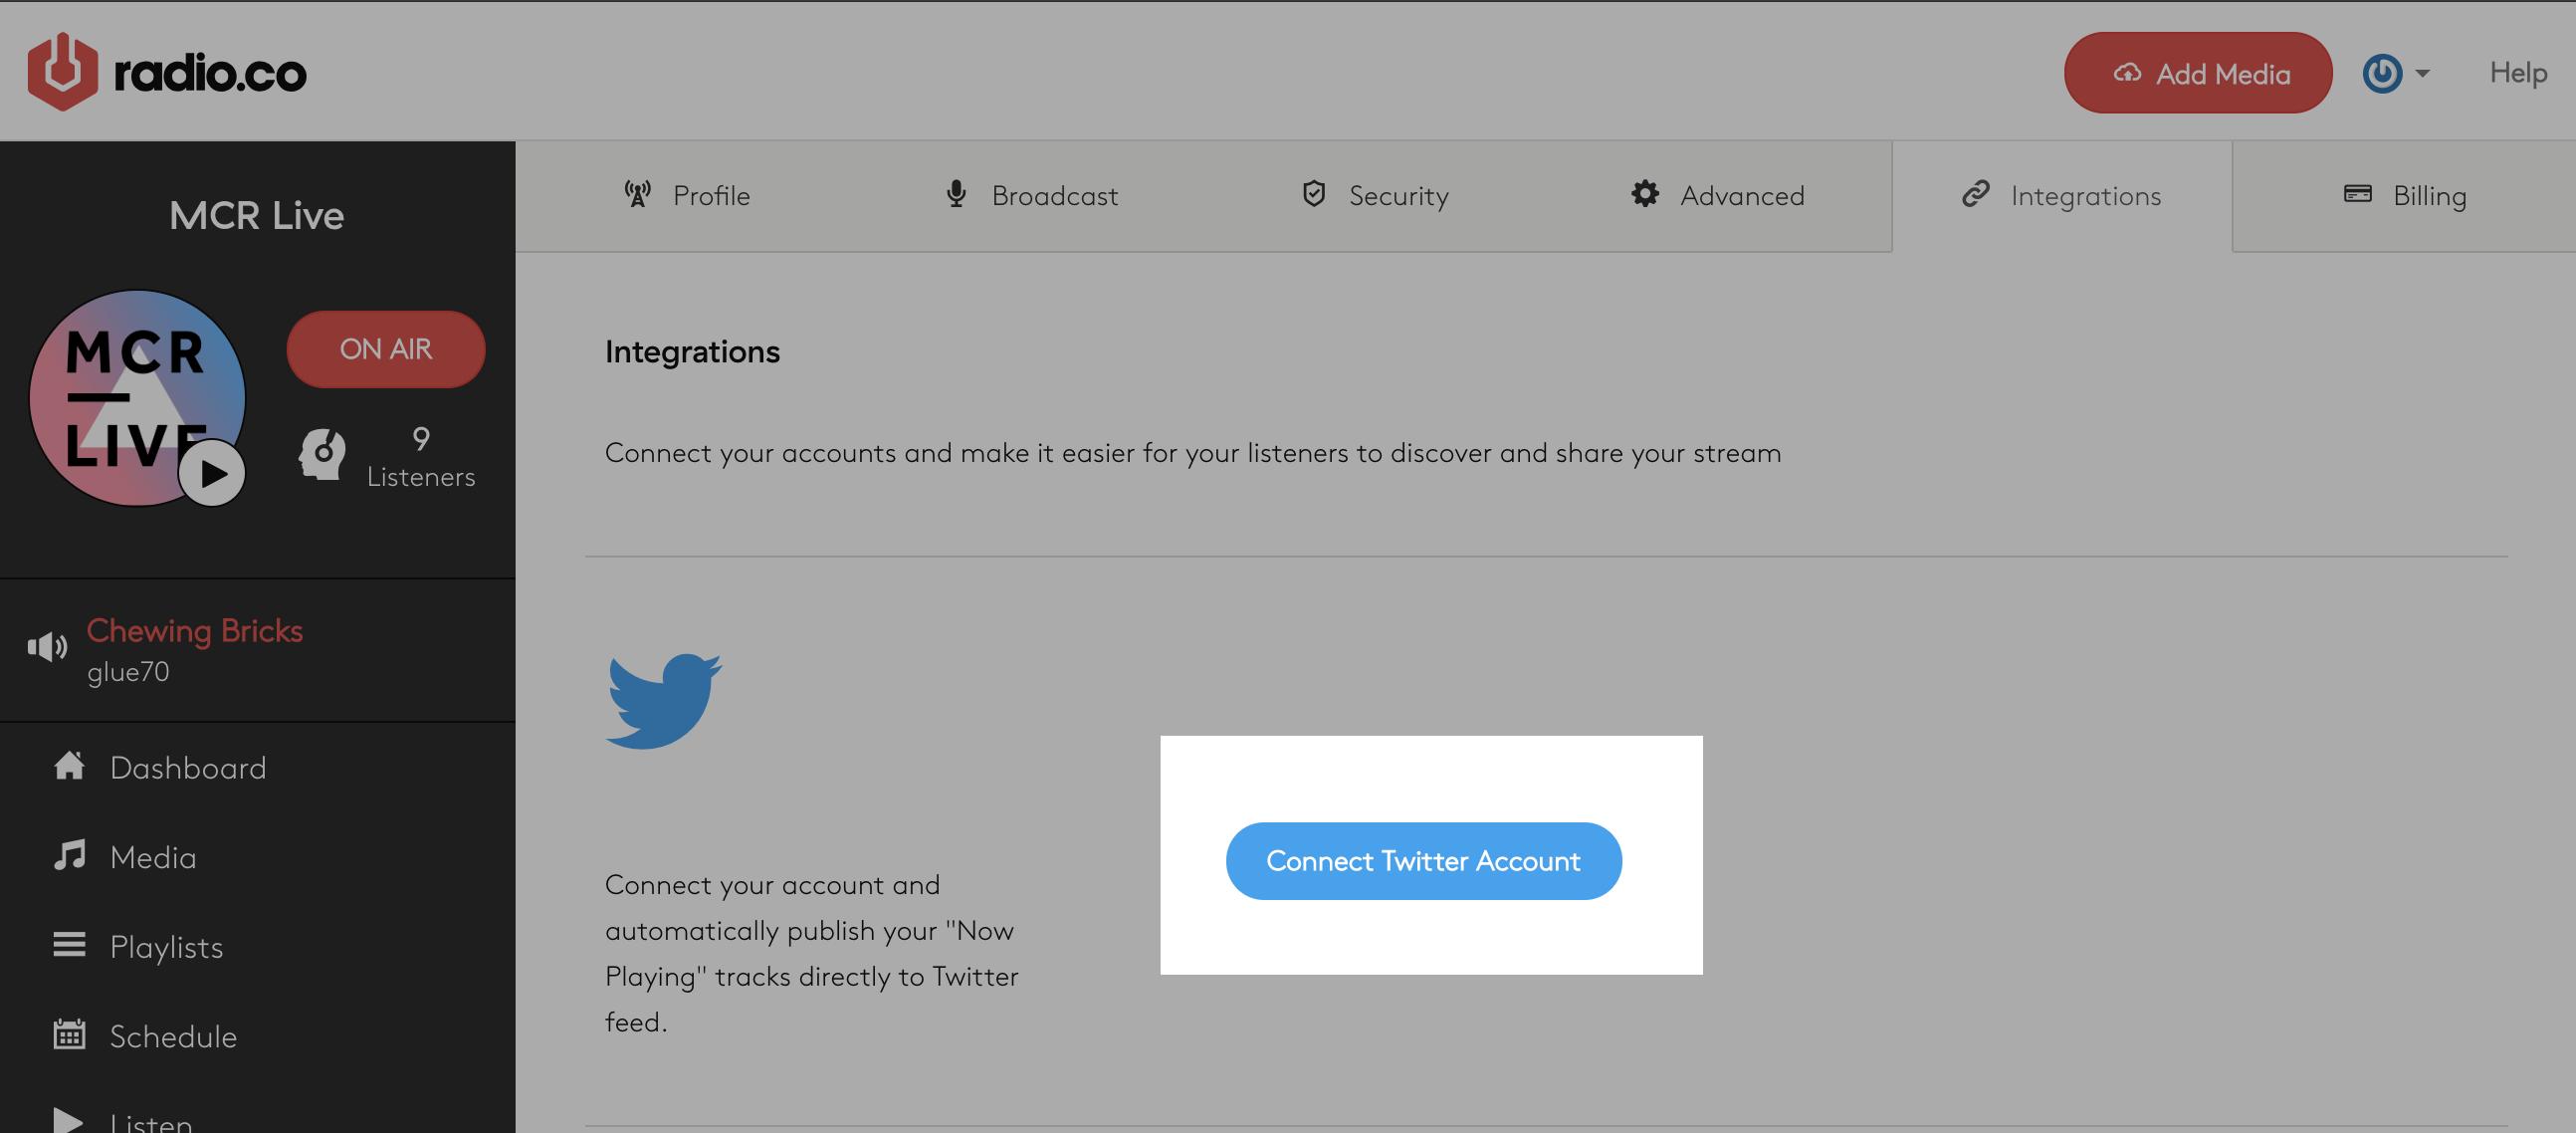 Twitter integration in Radio.co